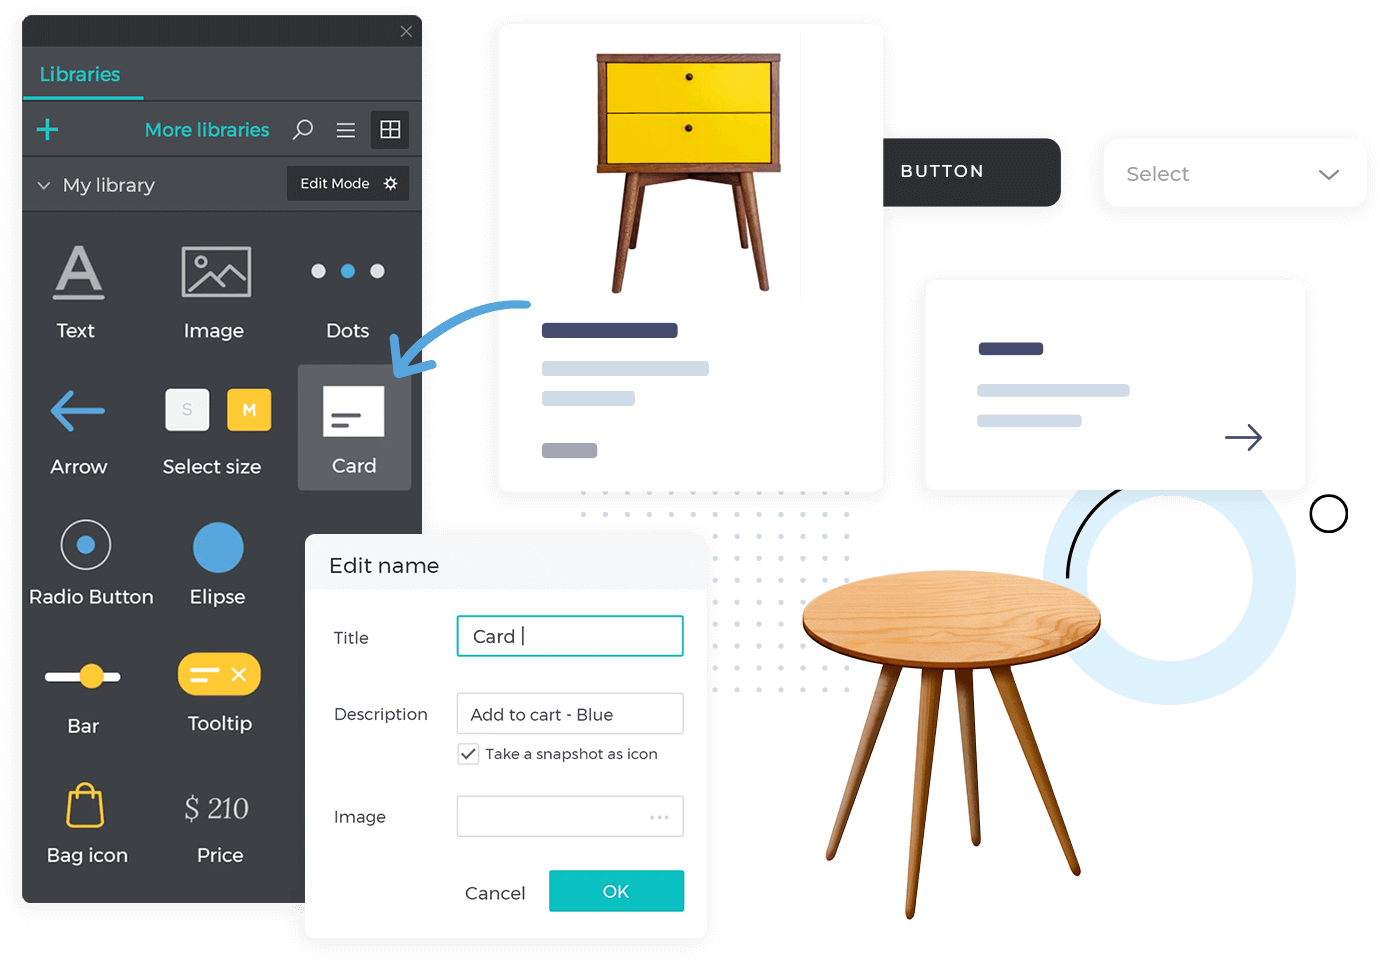 Design your own widget libraries in Justinmind